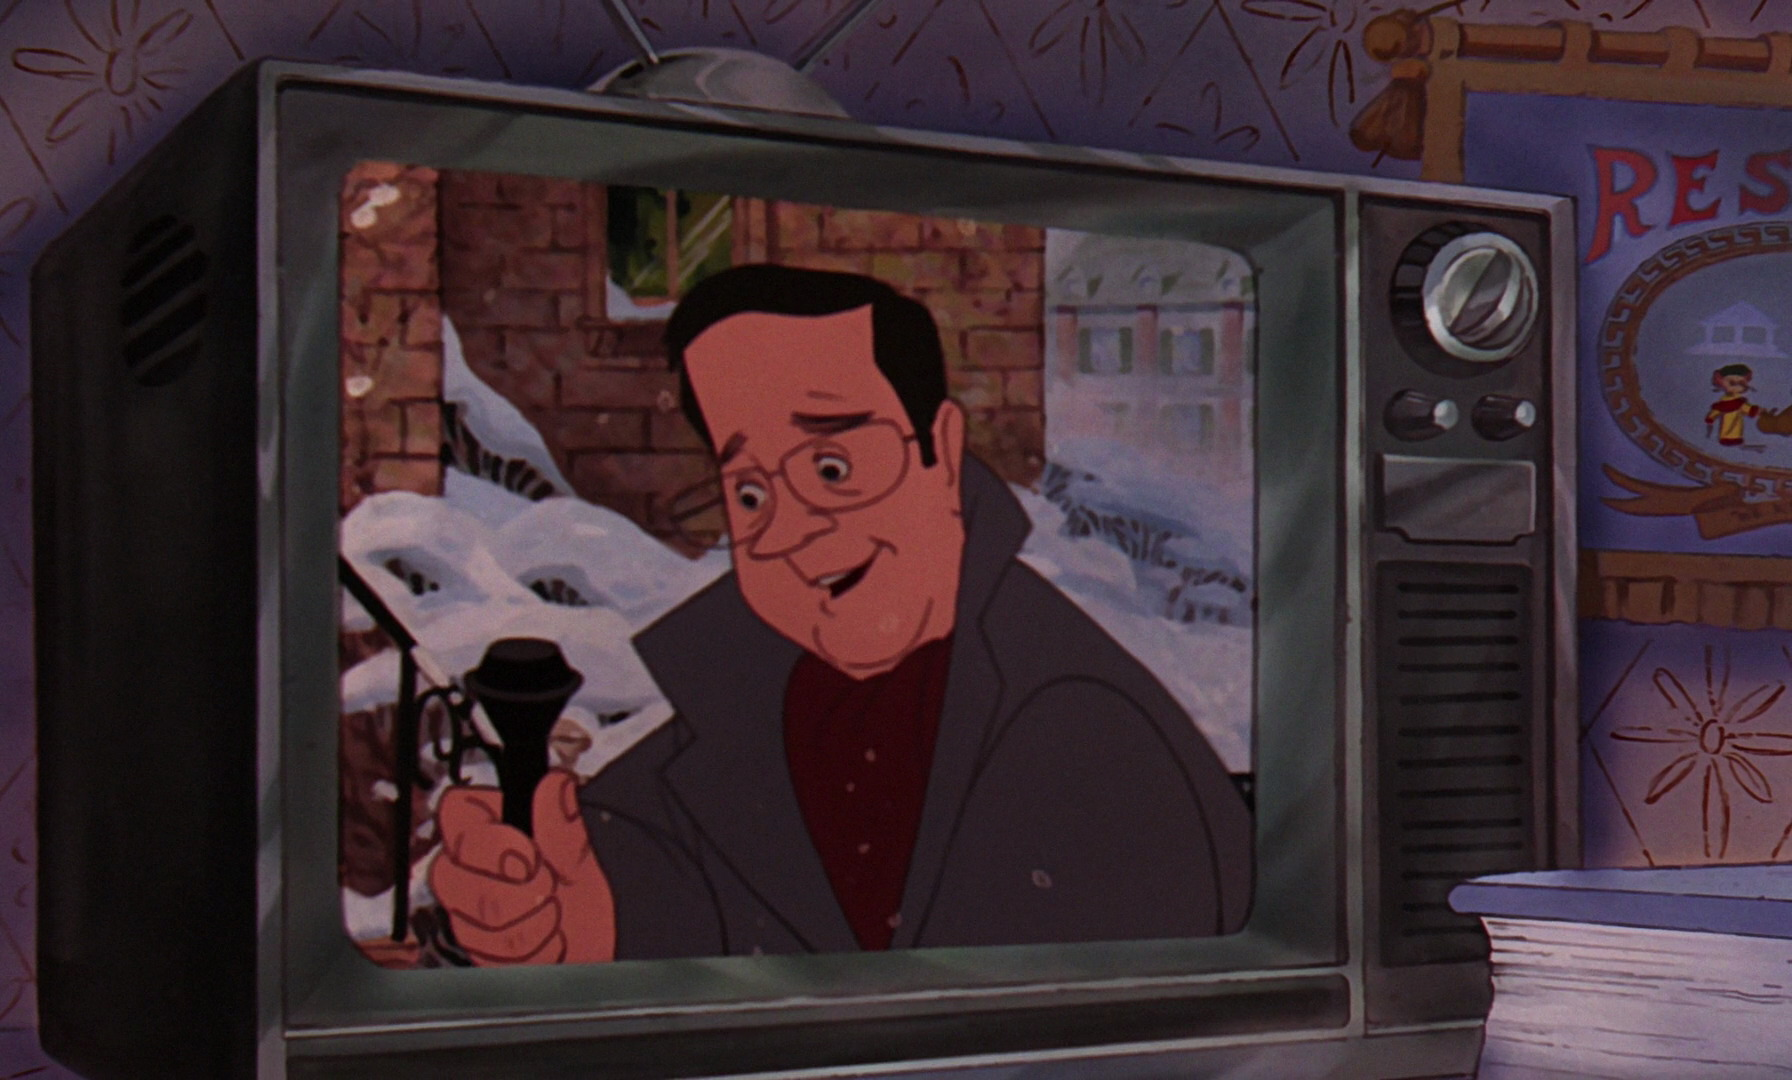 journaliste personnage character disney aventures bernard bianca rescuers